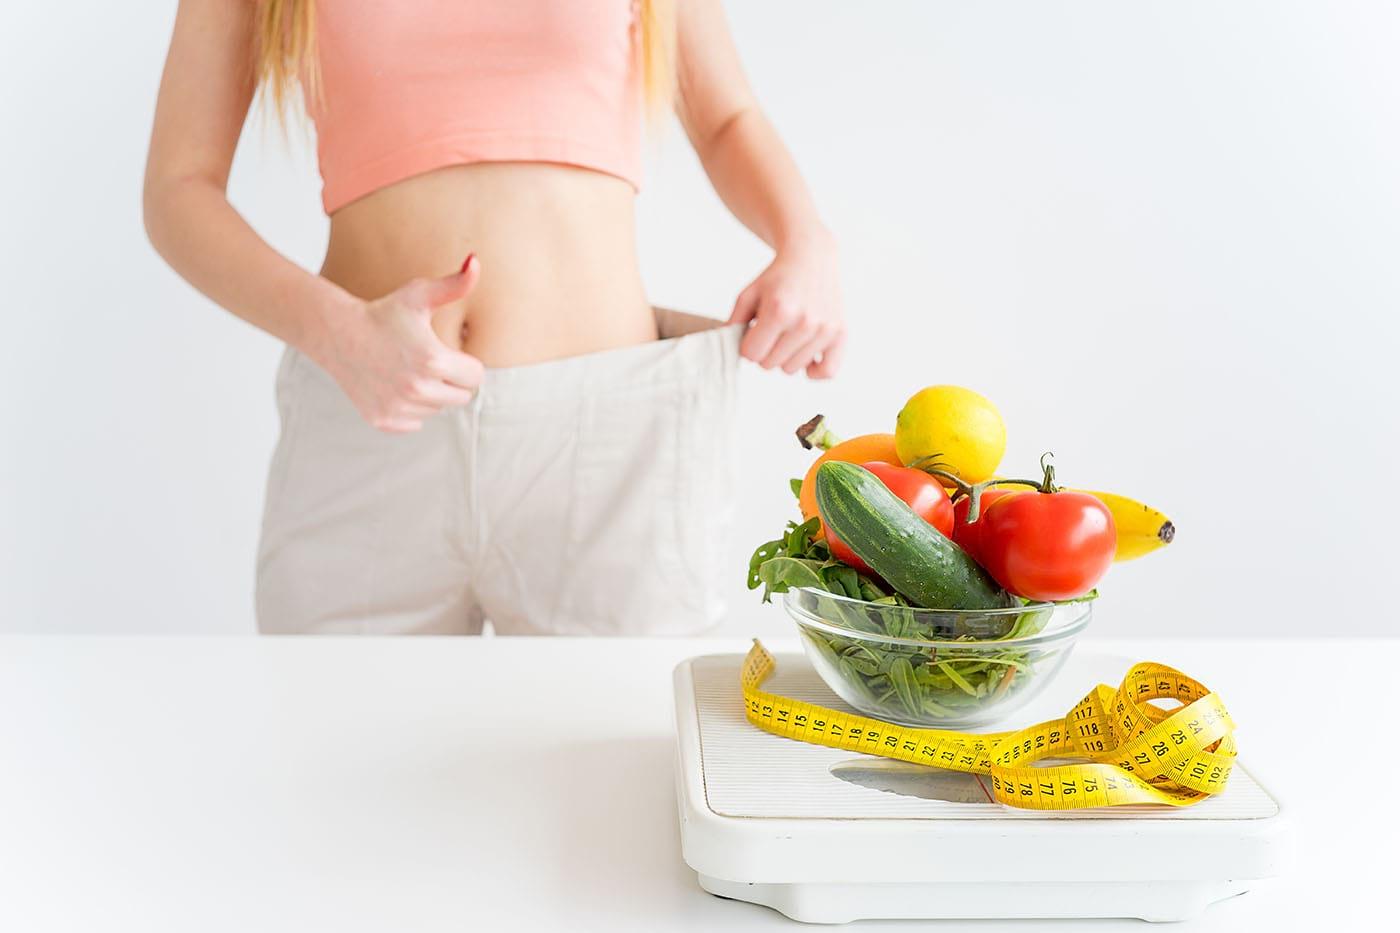 20 retete dieta vegetariana de slabit - retete culinare